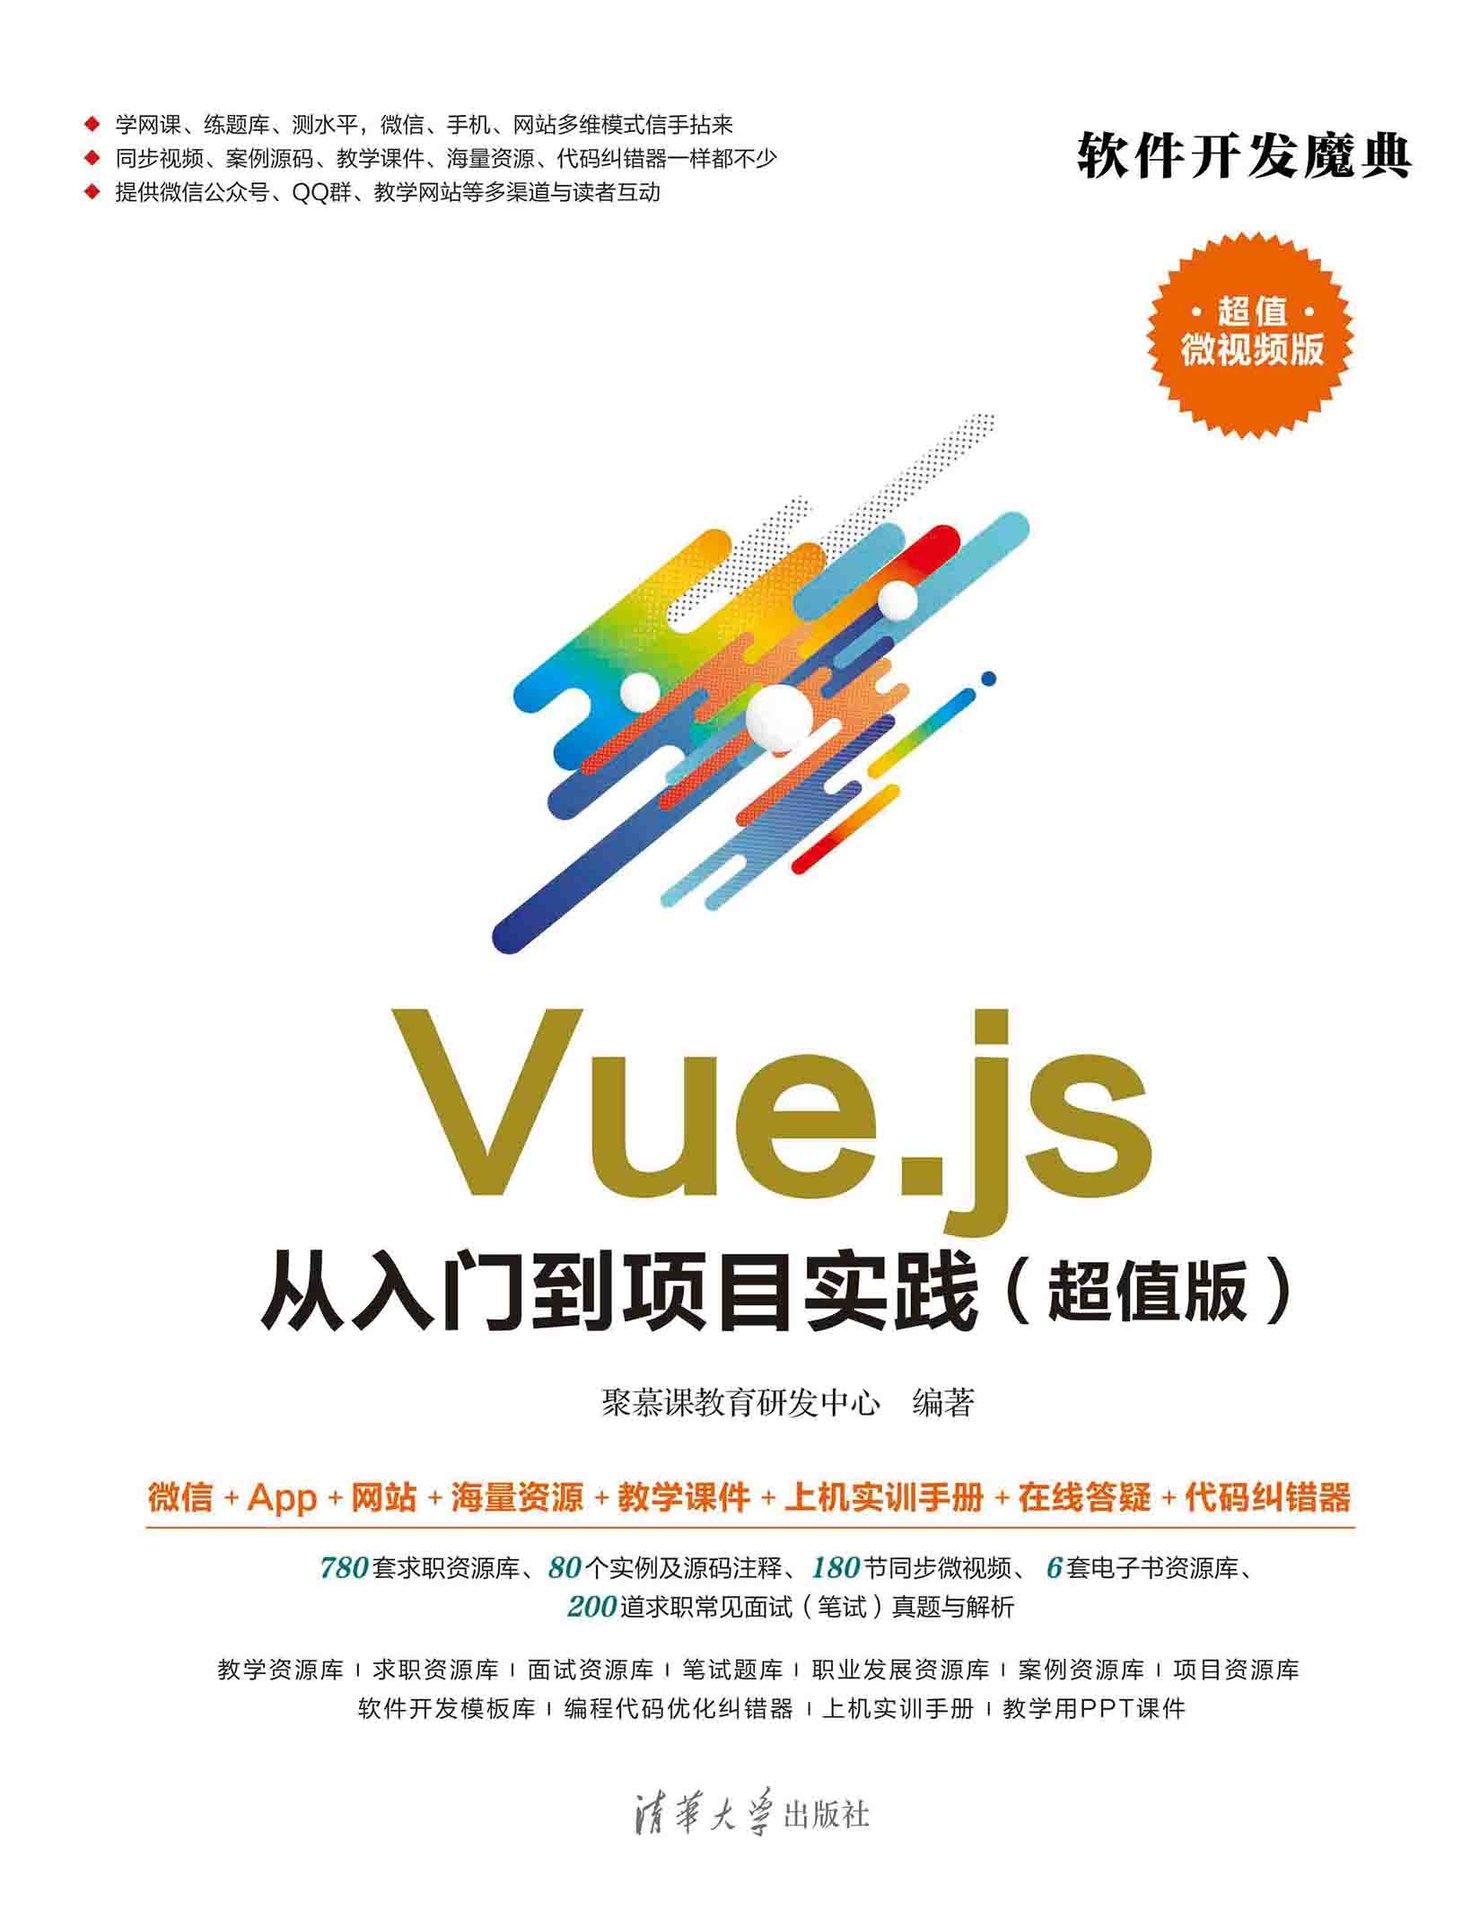 Vue.js 從入門到項目實踐 (超值版)-preview-1